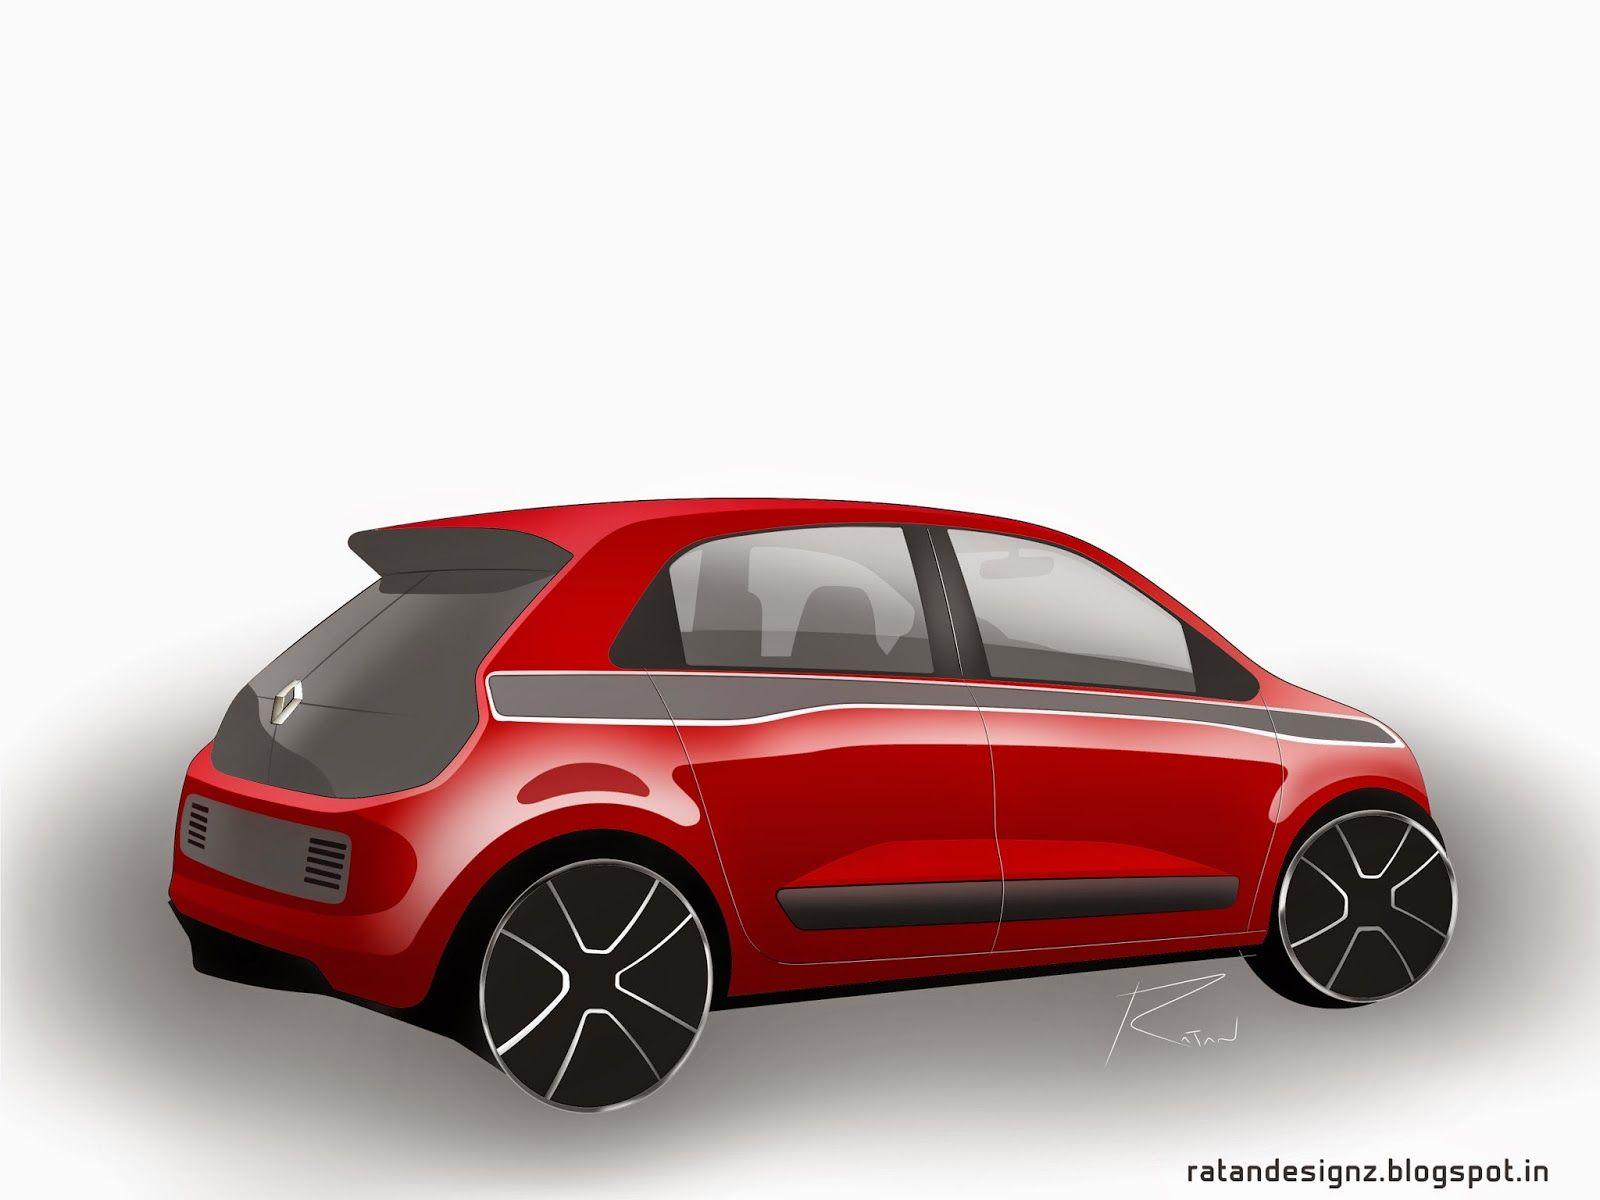 Renault Twingo Concept Design Sketch Digital Render Car Design